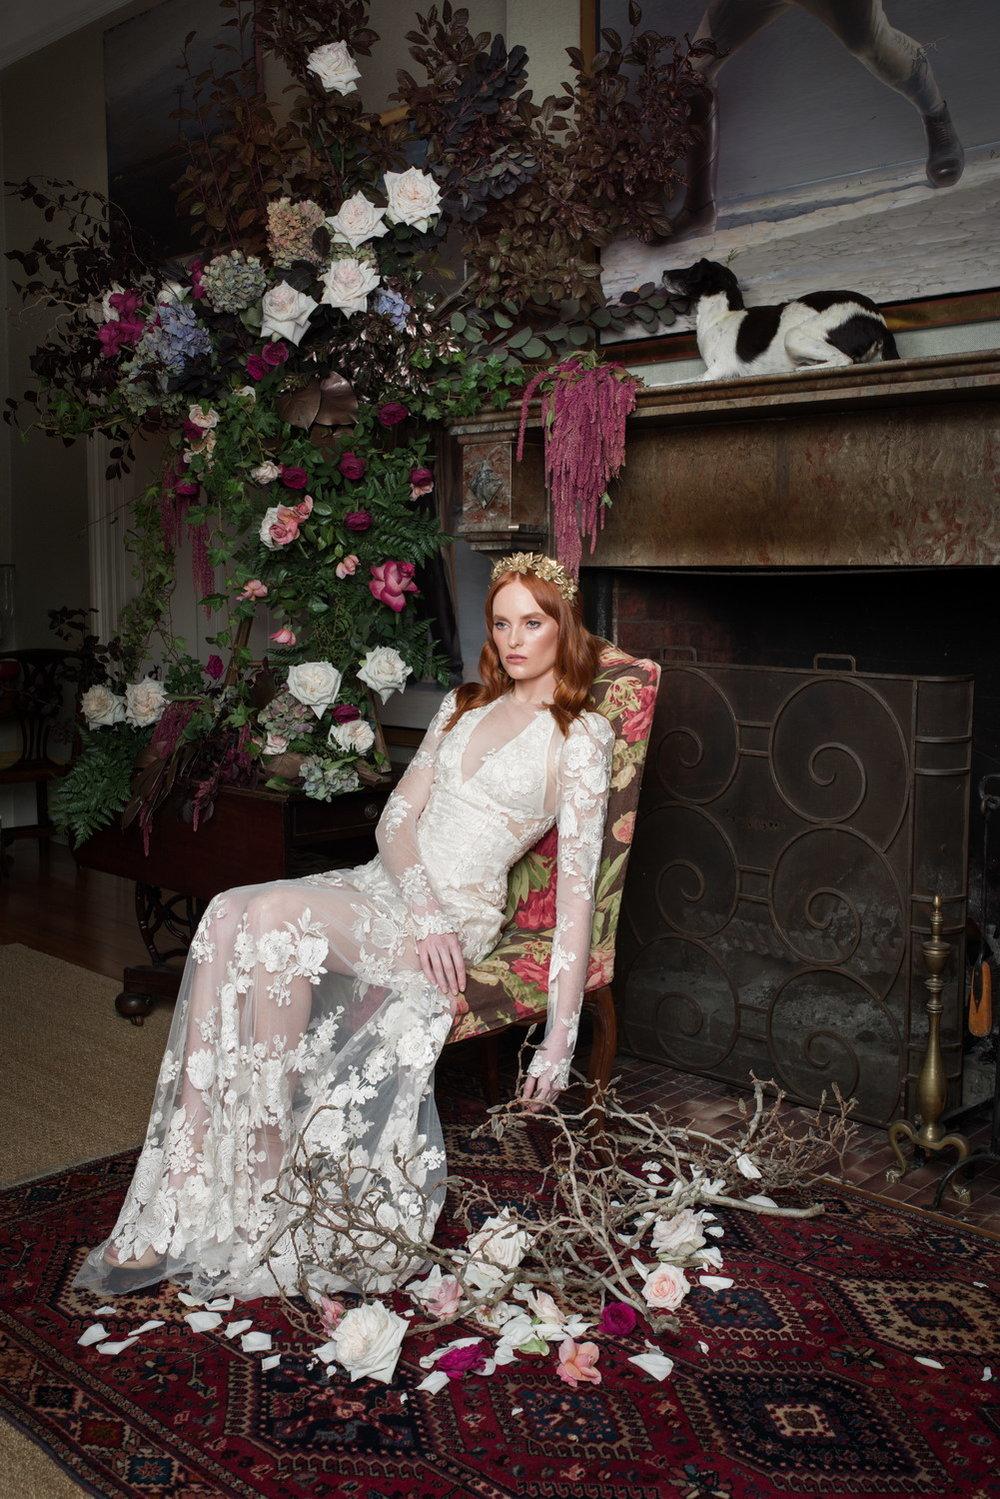 Viktoria-Novak-Immortal-Renaissance-2018-shoot-Hopewood-House5-KarenWoo14.jpg